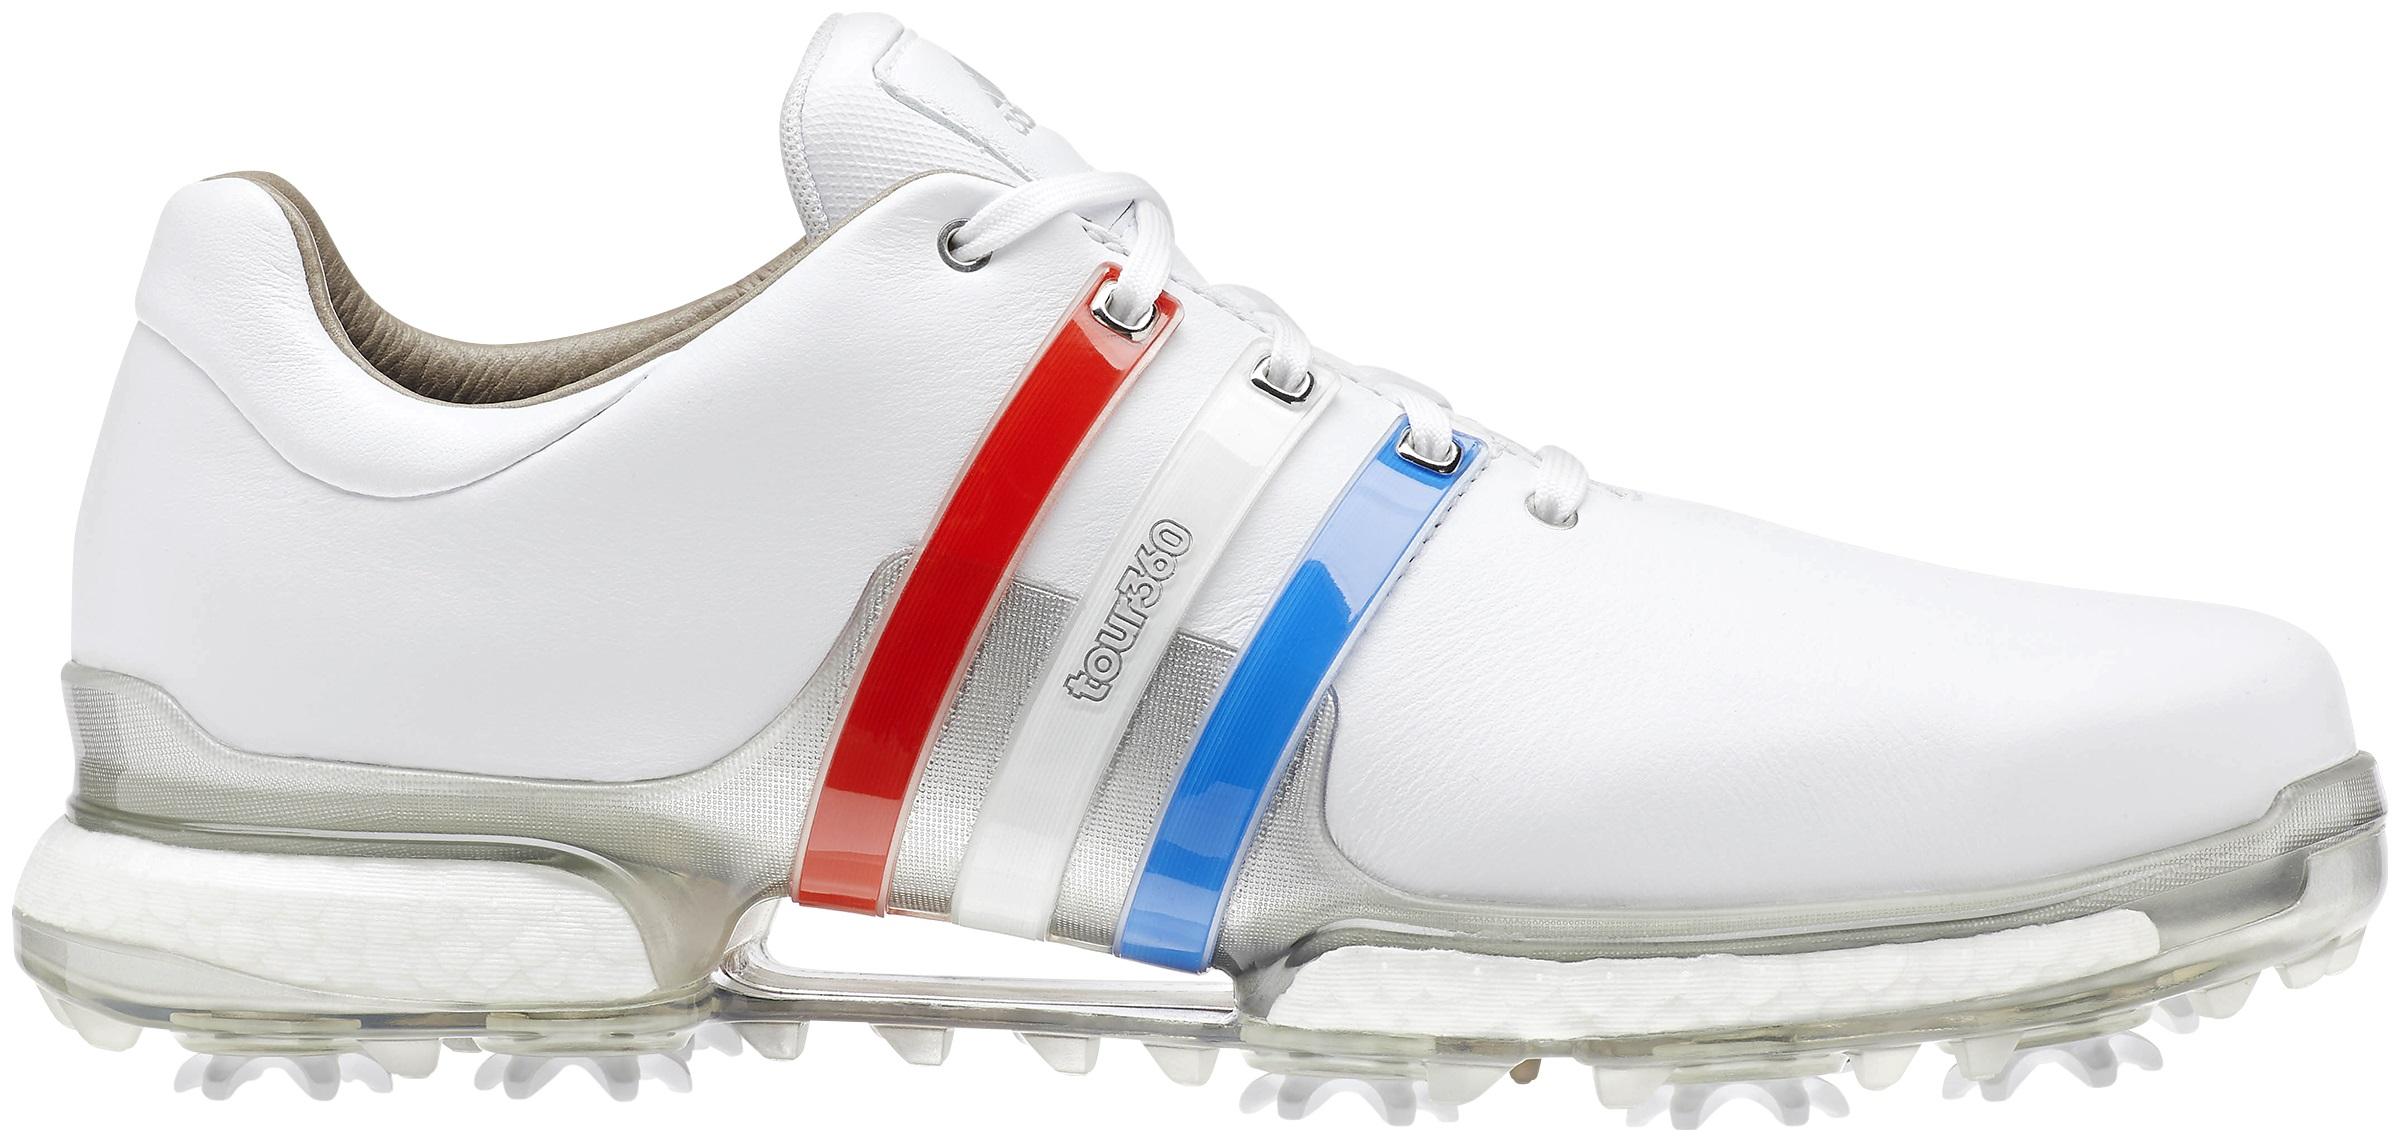 b7f108f226 Adidas USA Tour360 Boost 2.0 Shoes | RockBottomGolf.com